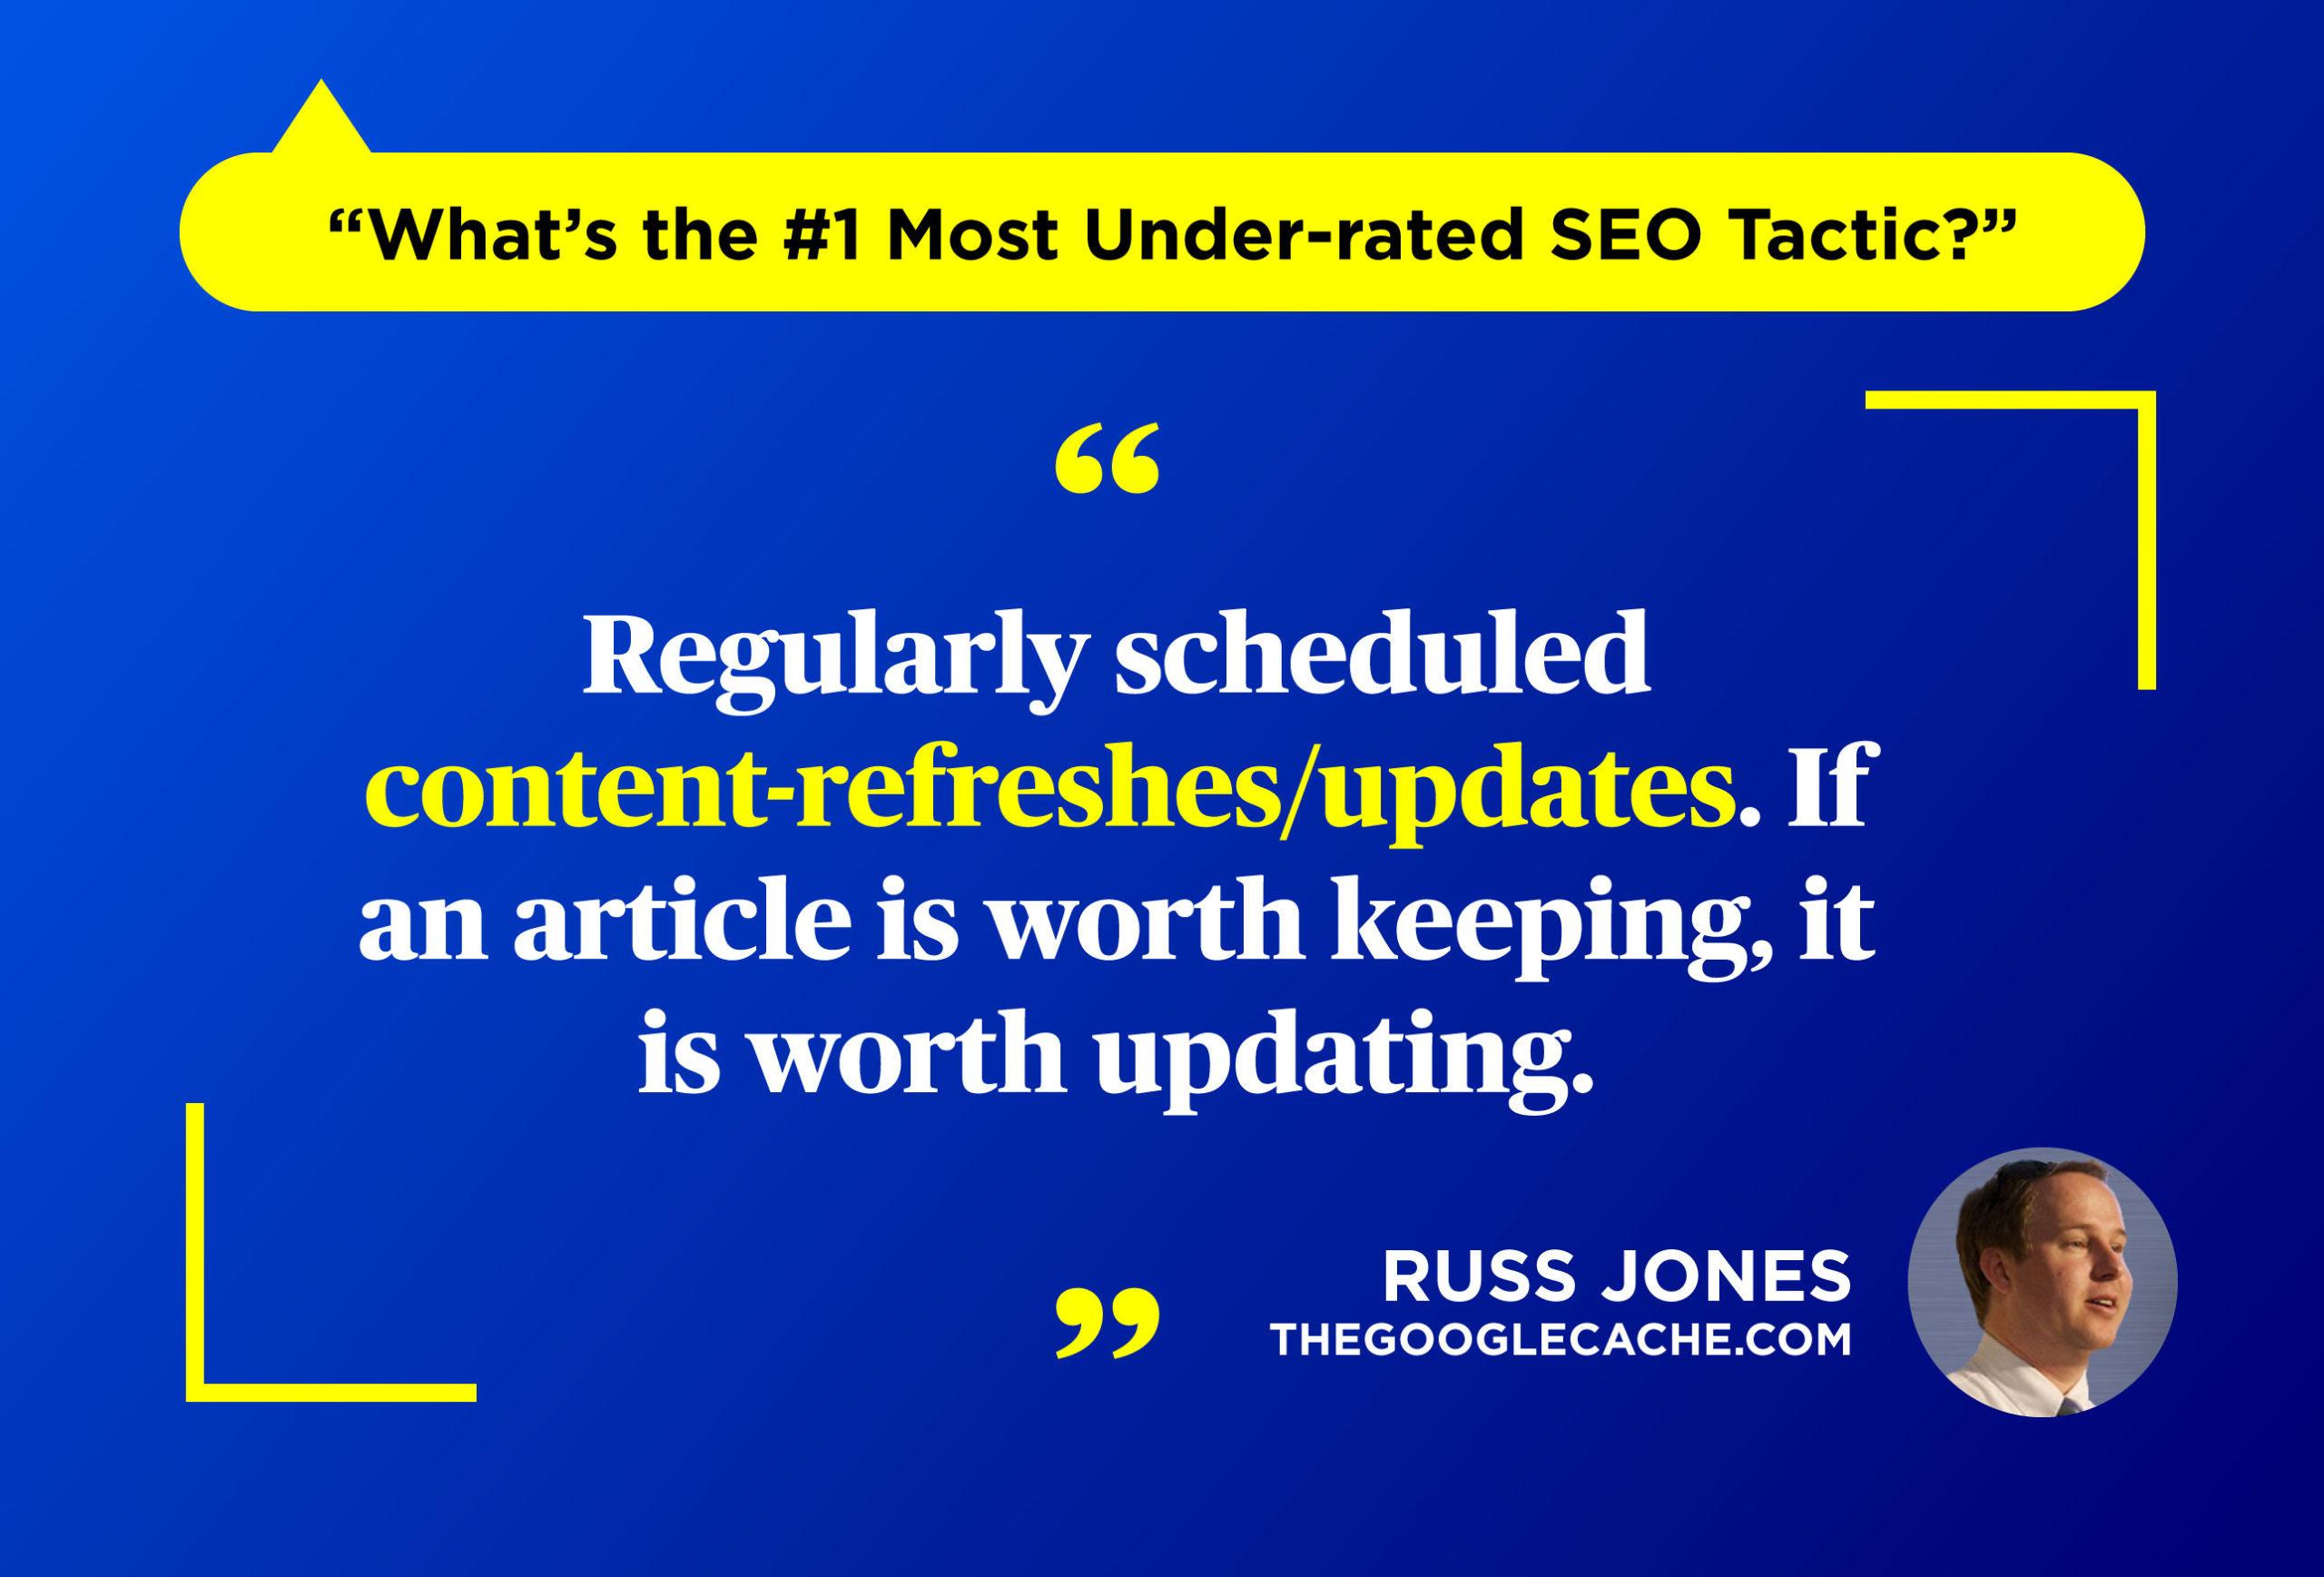 Under-rated SEO tactic - Russ Jones on Twitter